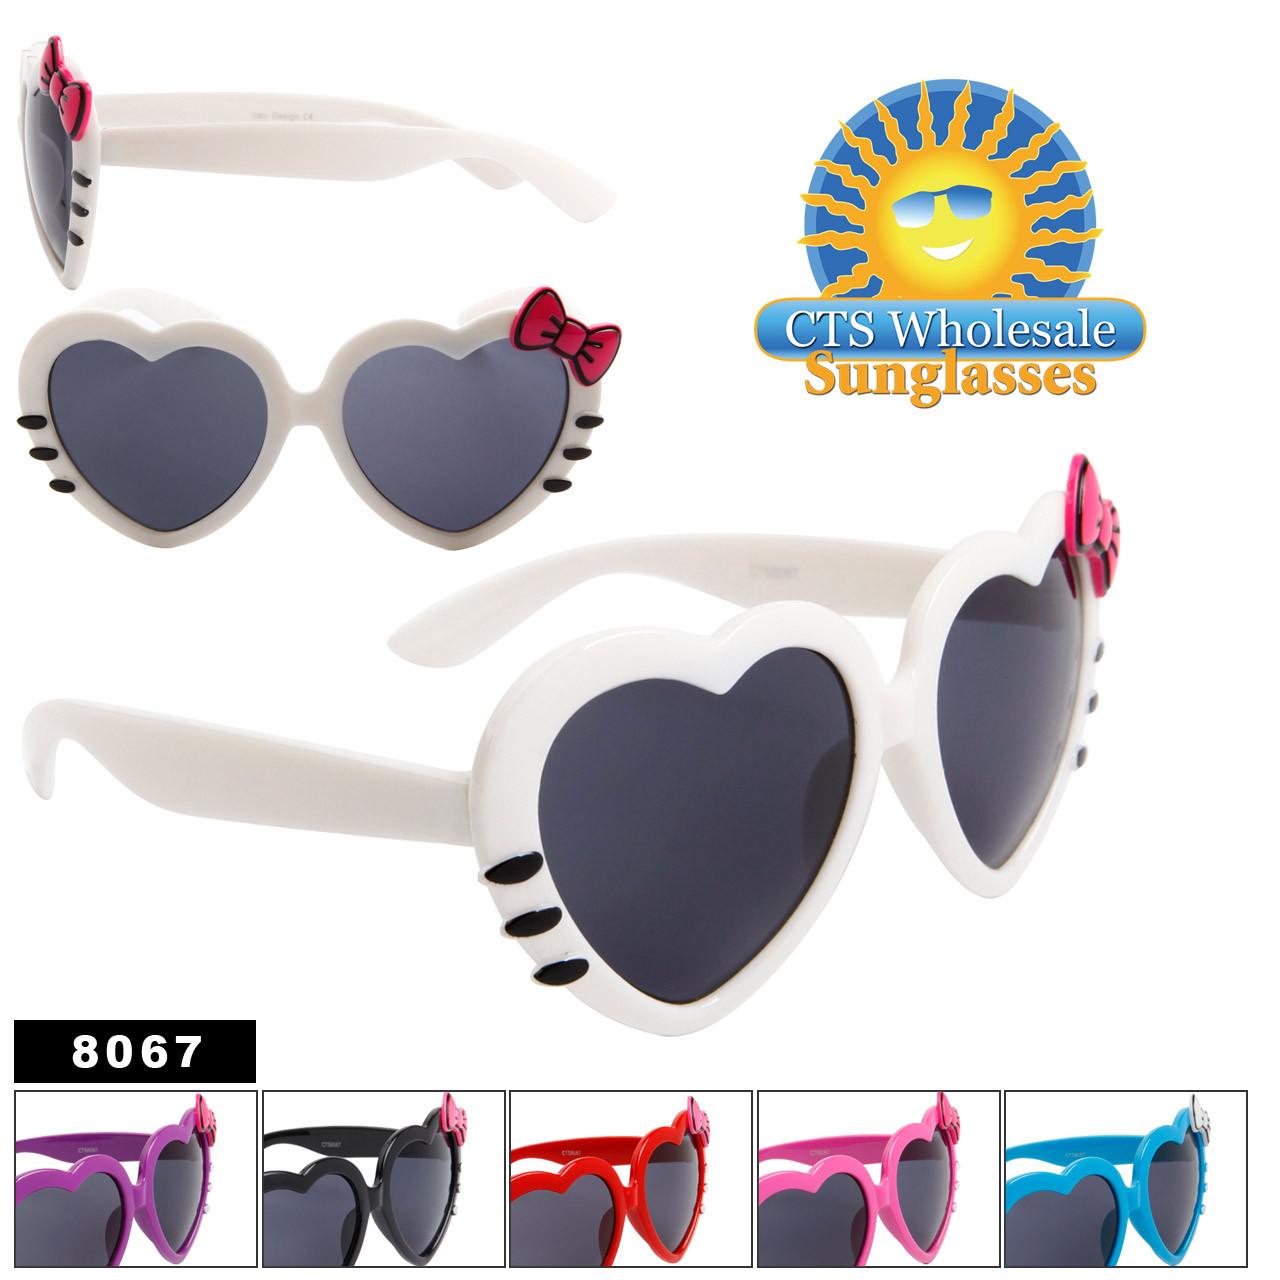 Wholesale Heart Sunglasses - Style # 8067